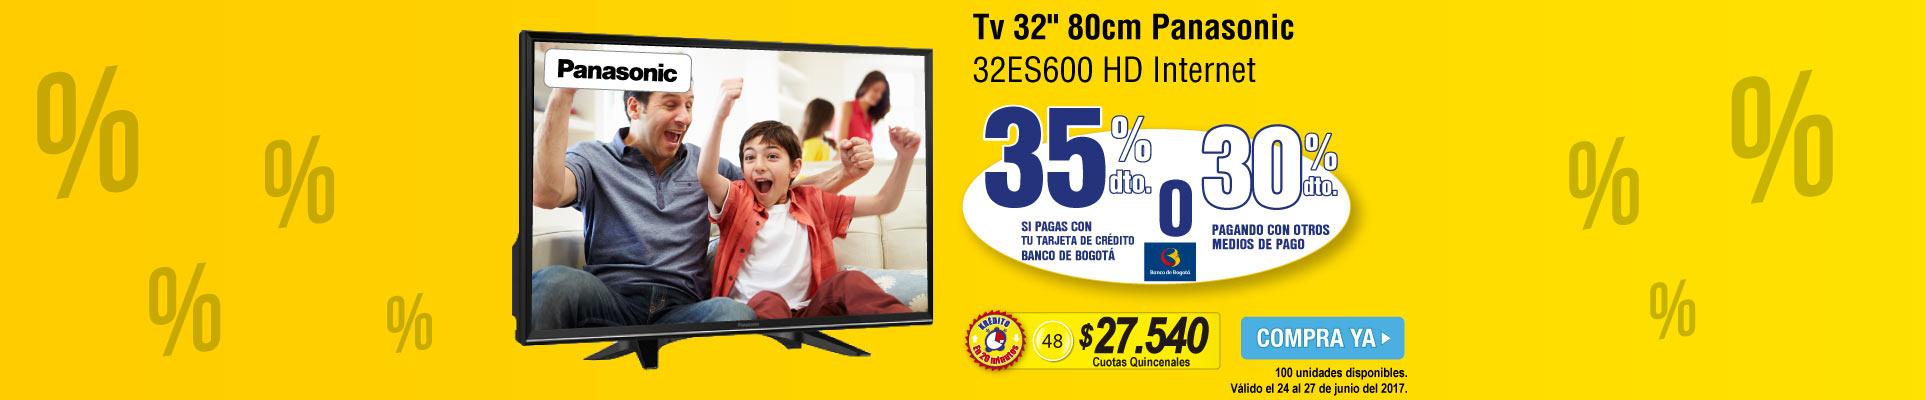 Tv 32 80cm Panasonic 32ES600 HD Internet - banner principal